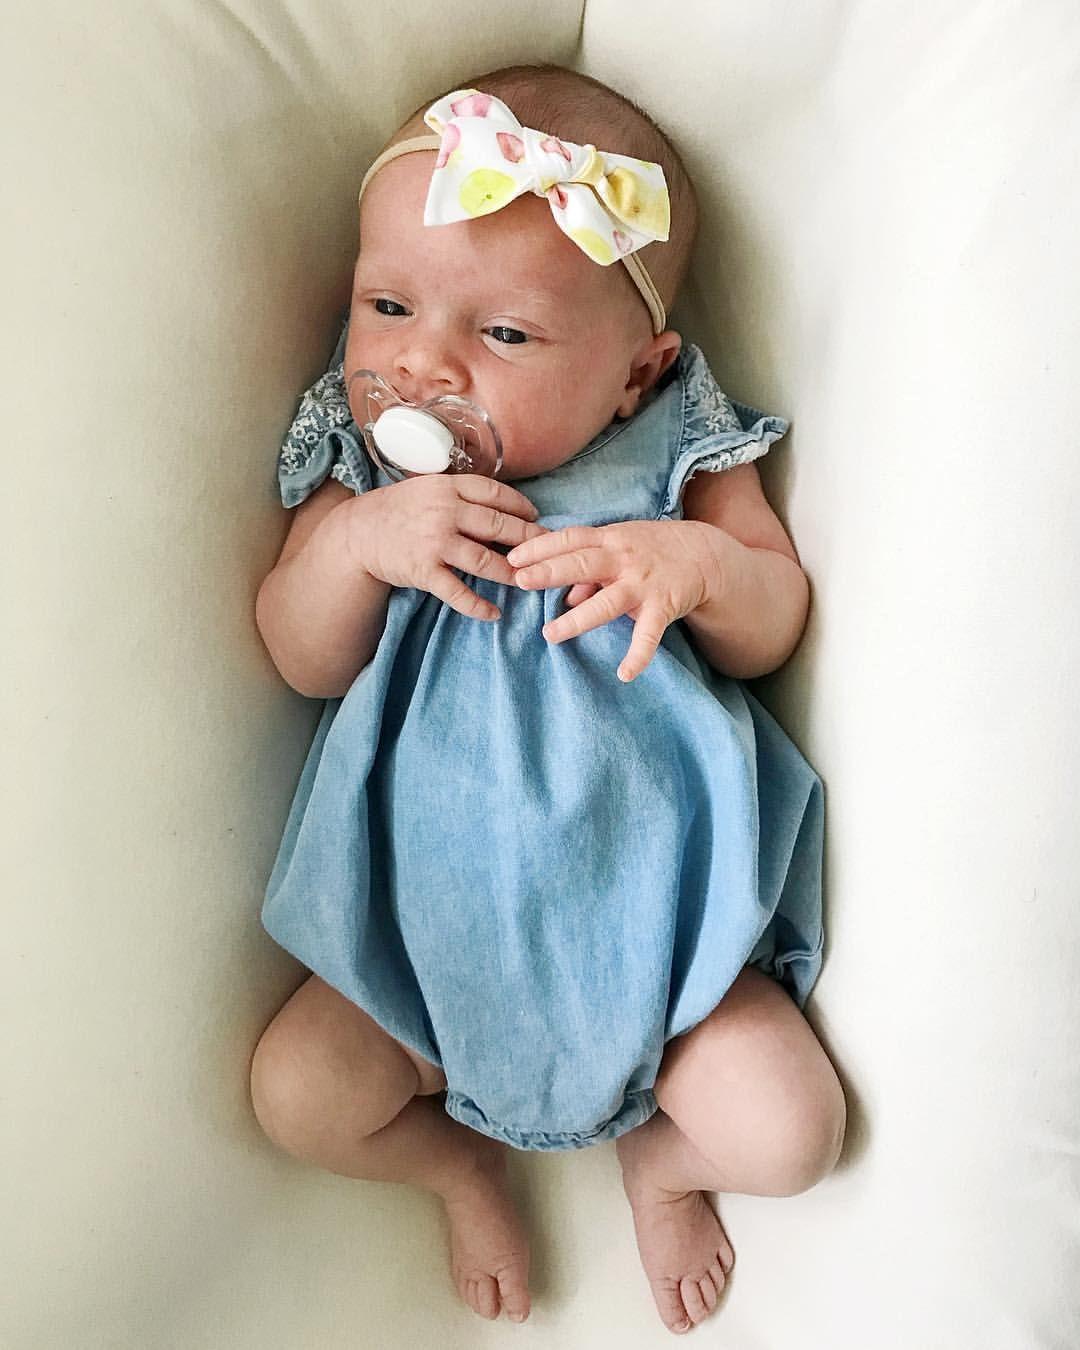 Baby girl newborn. Baby girl chambray. Baby girl outfit. Summer